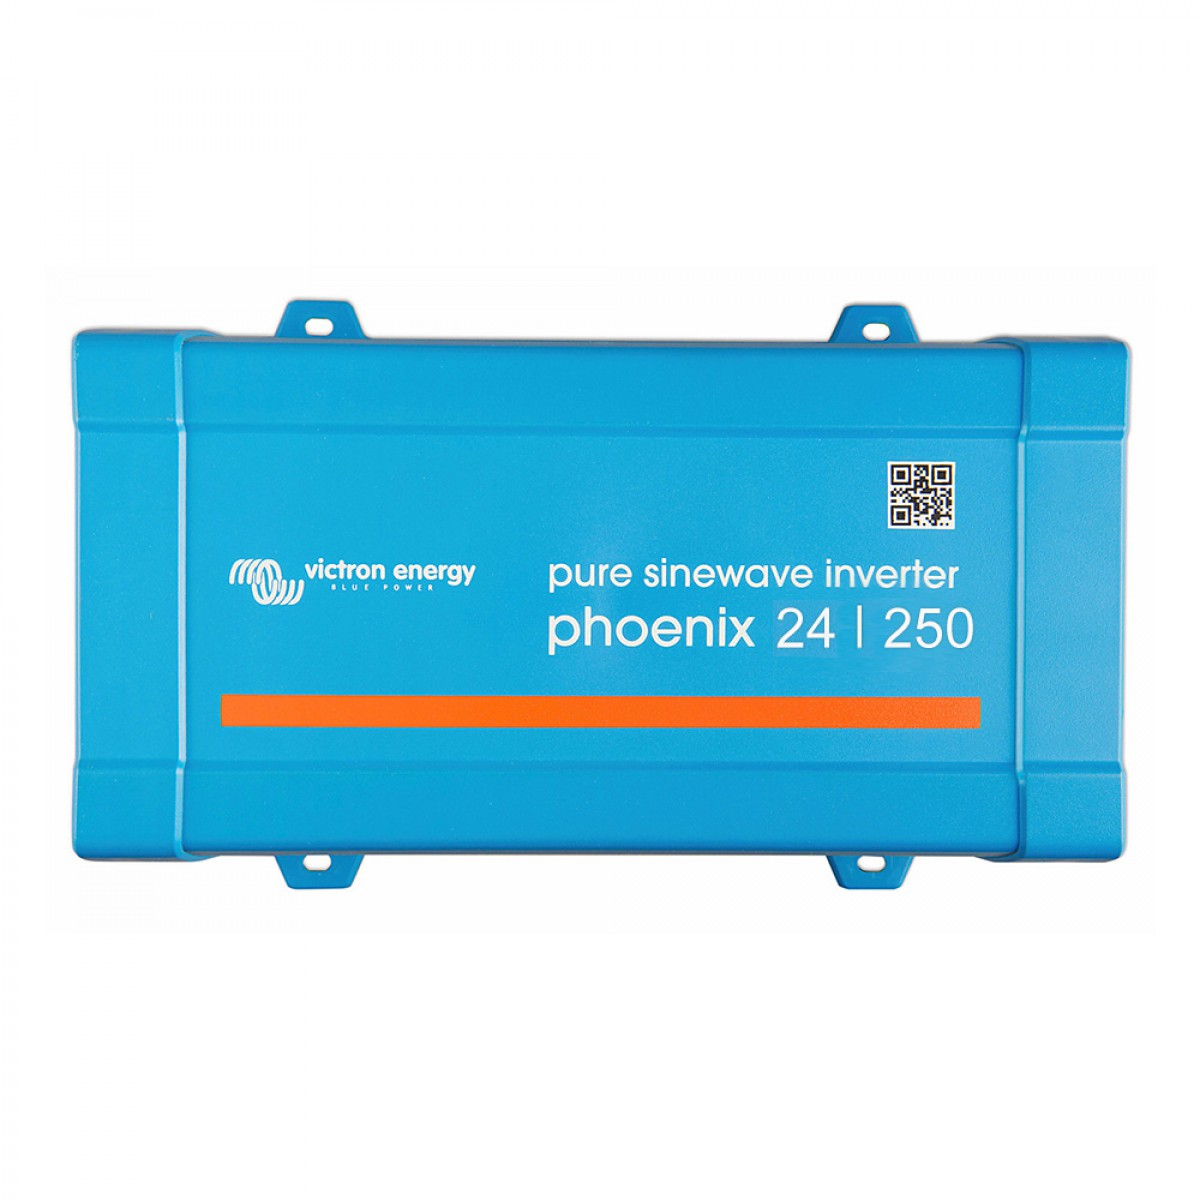 1 Stk Inselwechselrichter 24V 250W PVBI25024-